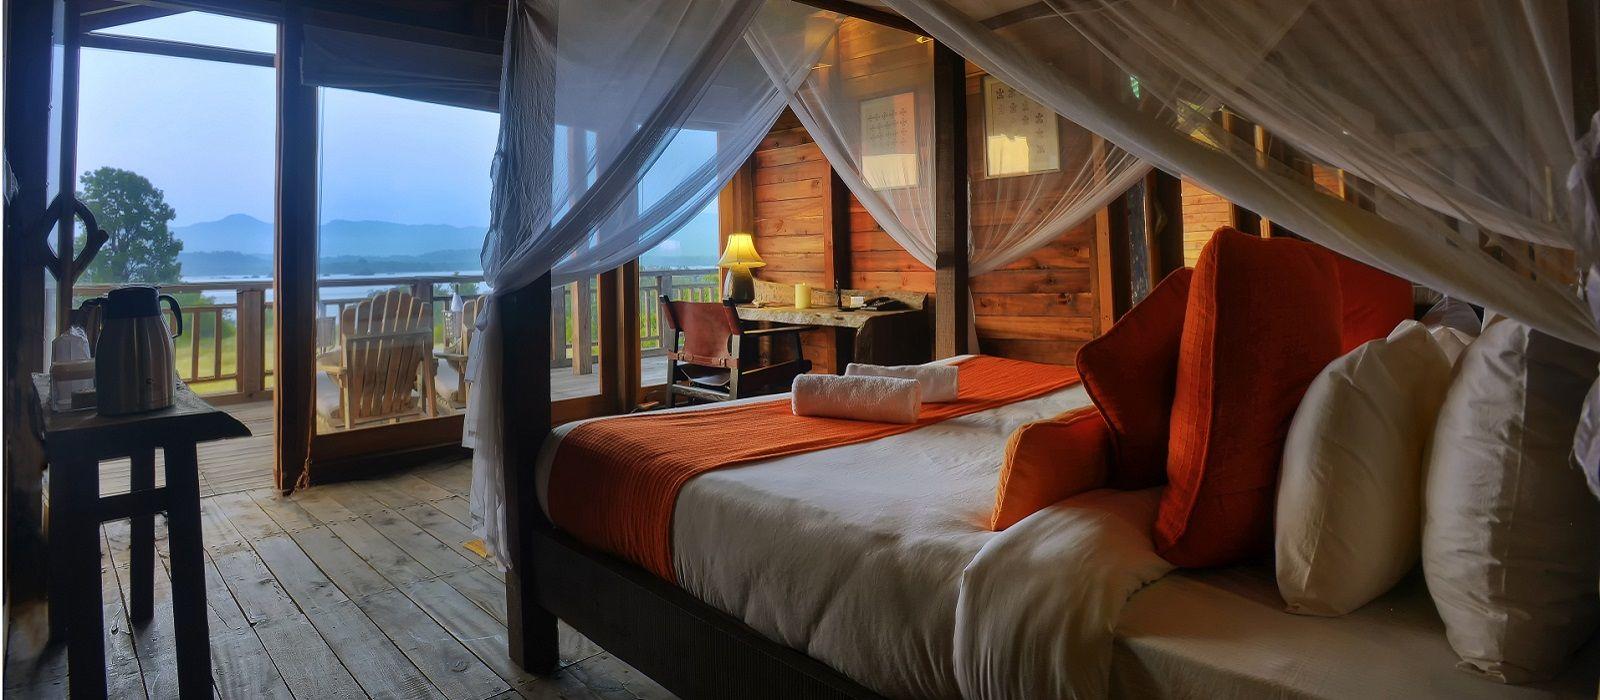 Hotel Denwa Backwater Escape Central & West India